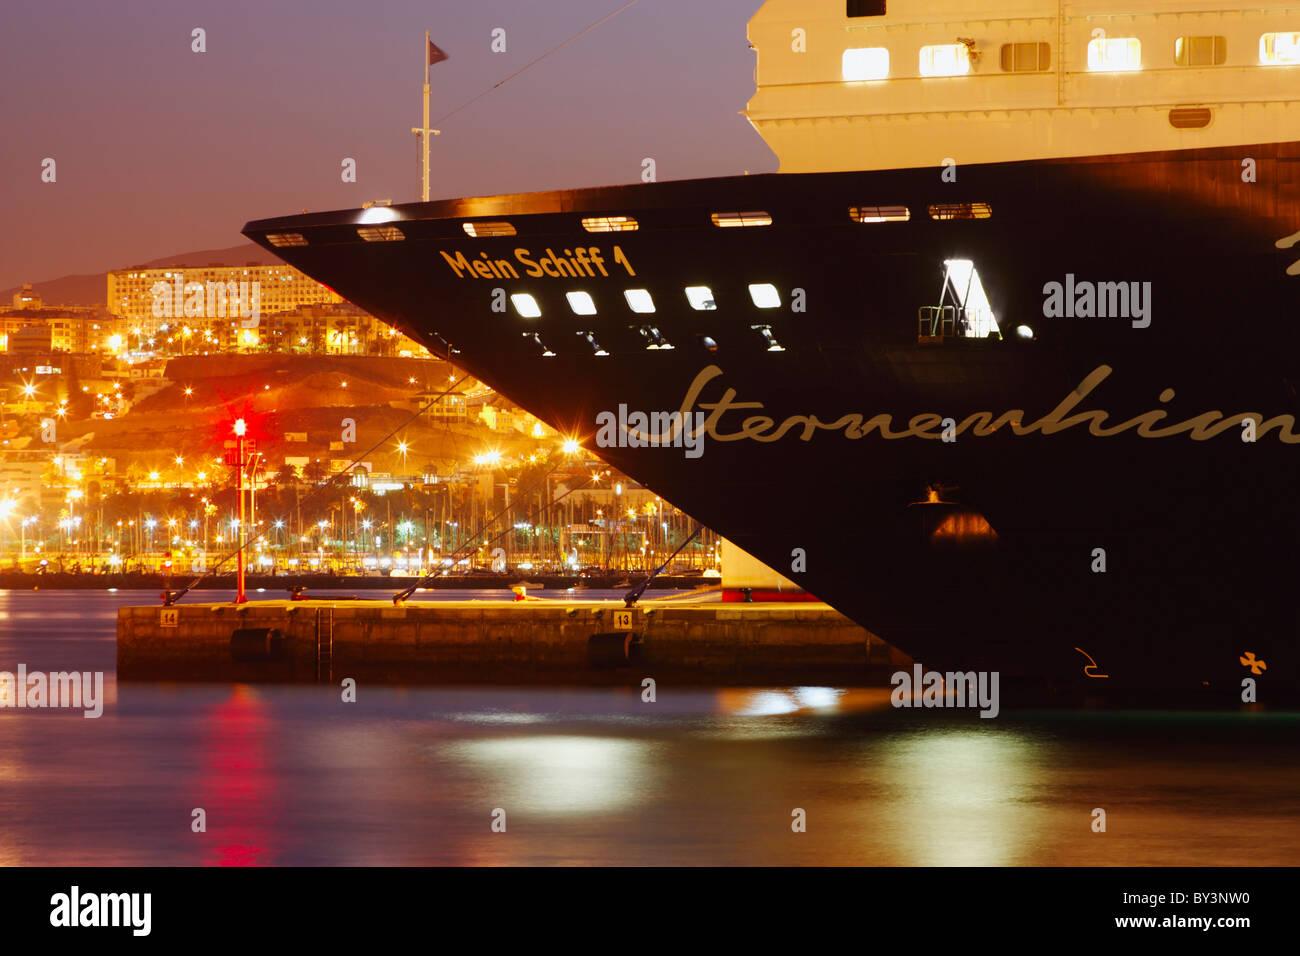 Tui cruise ship 'Mein Schiff' in Las Palmas on Gran Canaria, Canary Islands, Spain - Stock Image